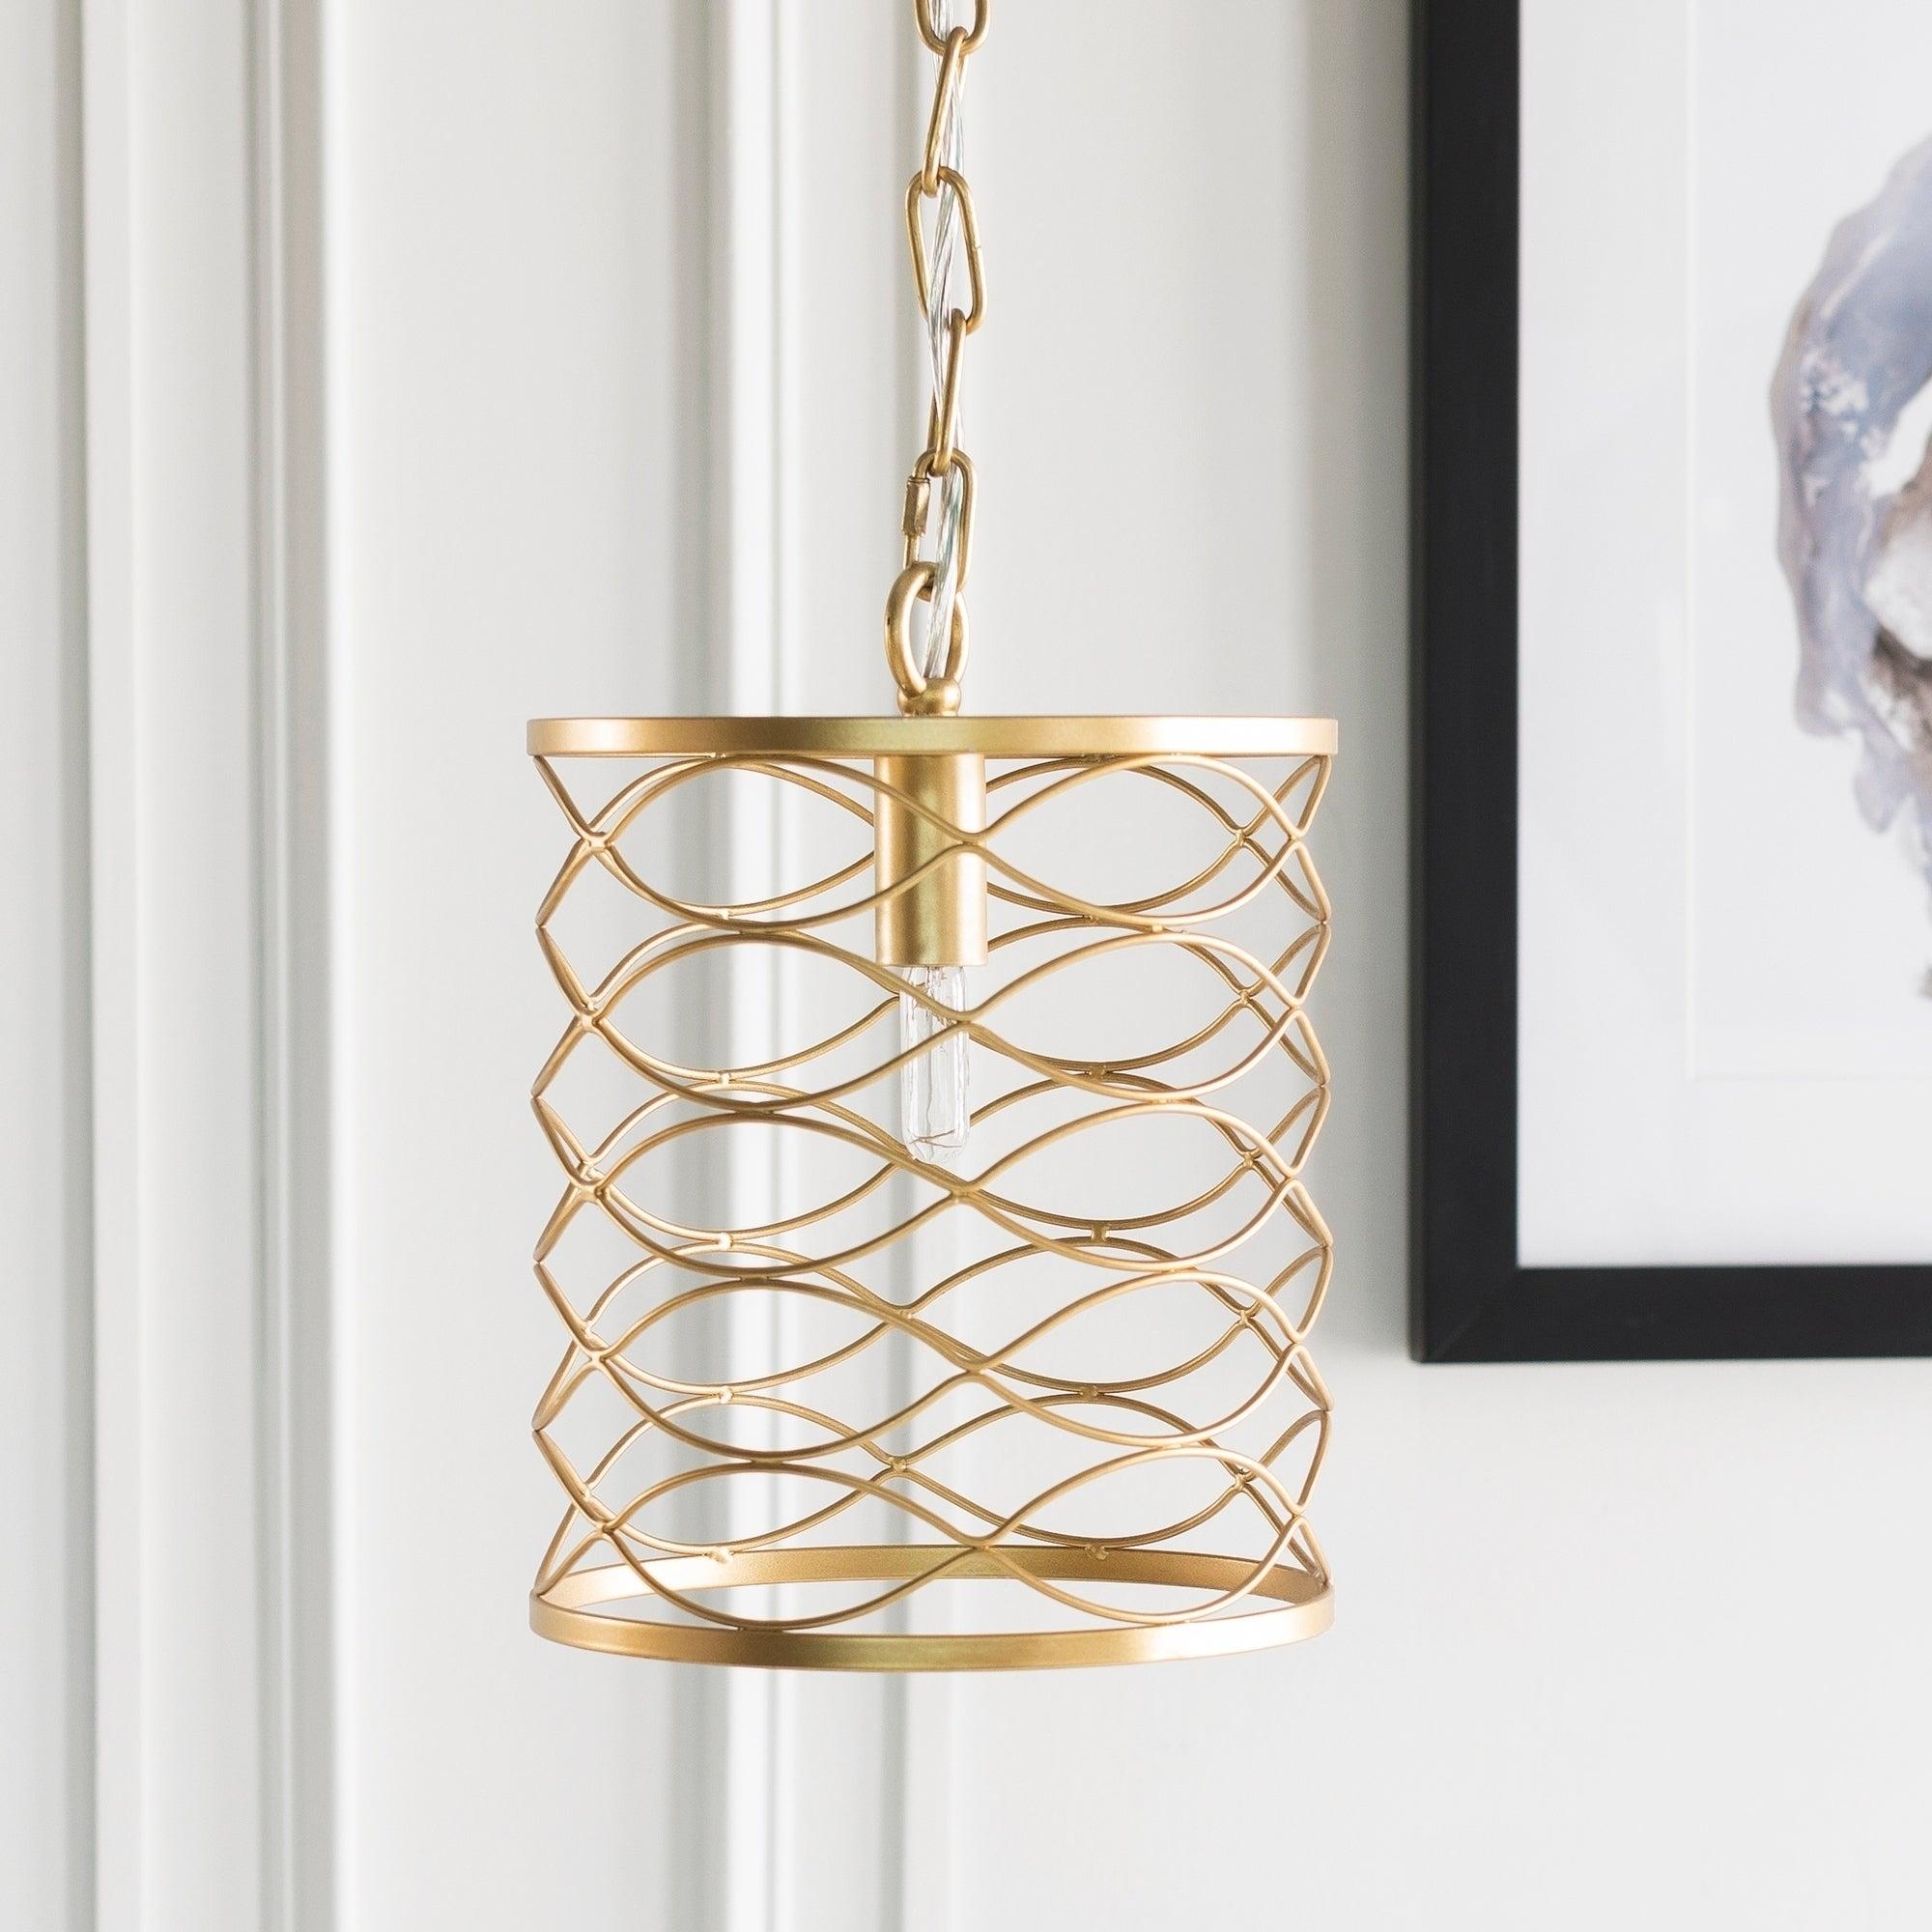 Shop Francene Updated Traditional Gold Pendant Lighting Fixture On Sale Overstock 20873230